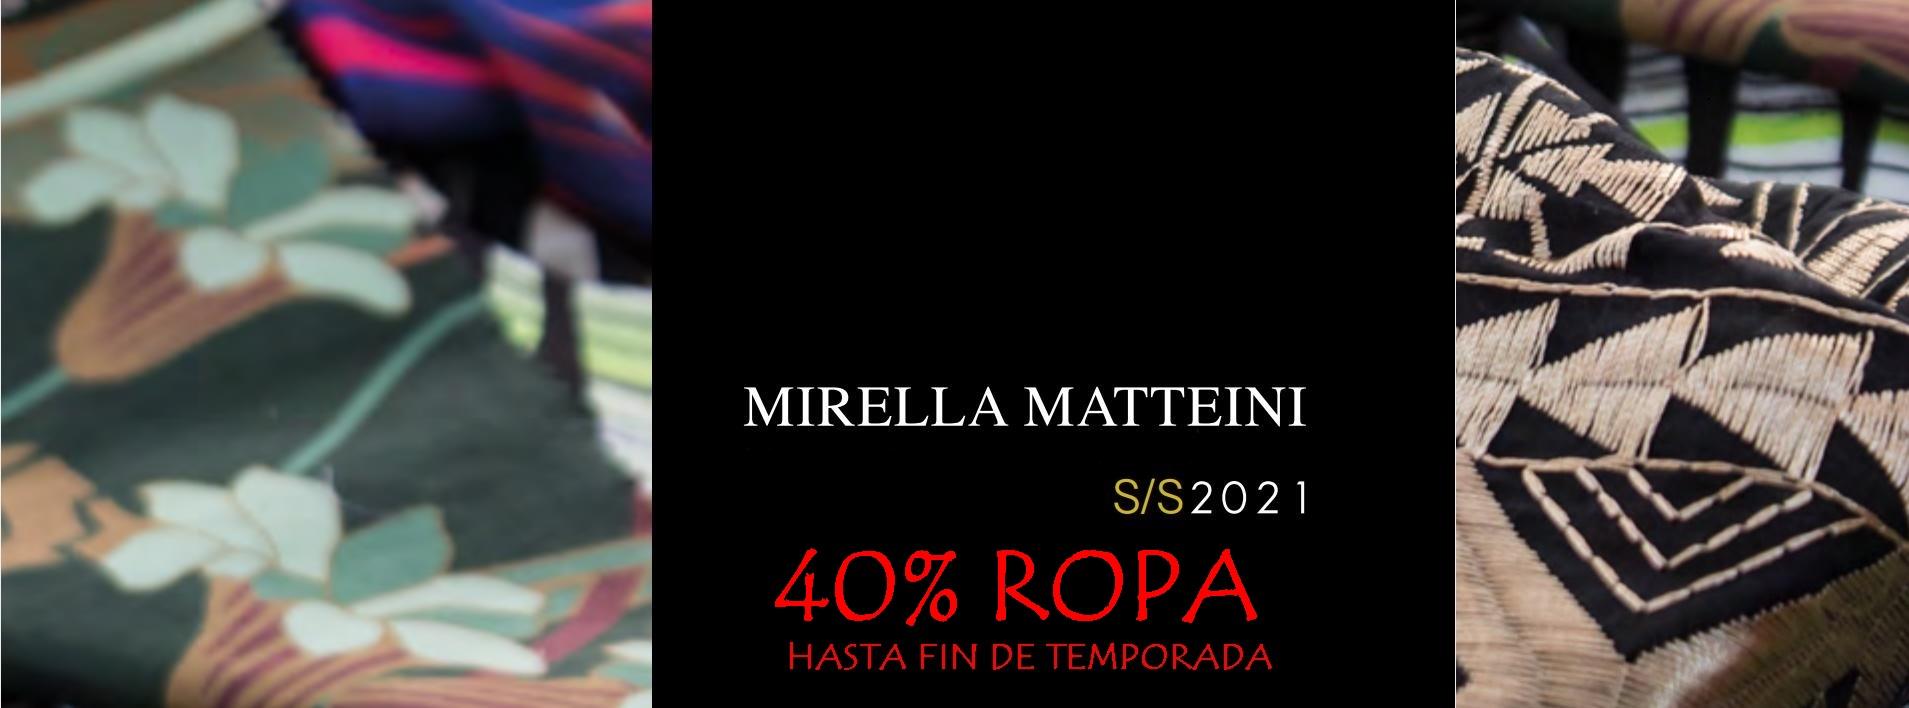 mirella-matteini-banner-primavera-verano-rebajas